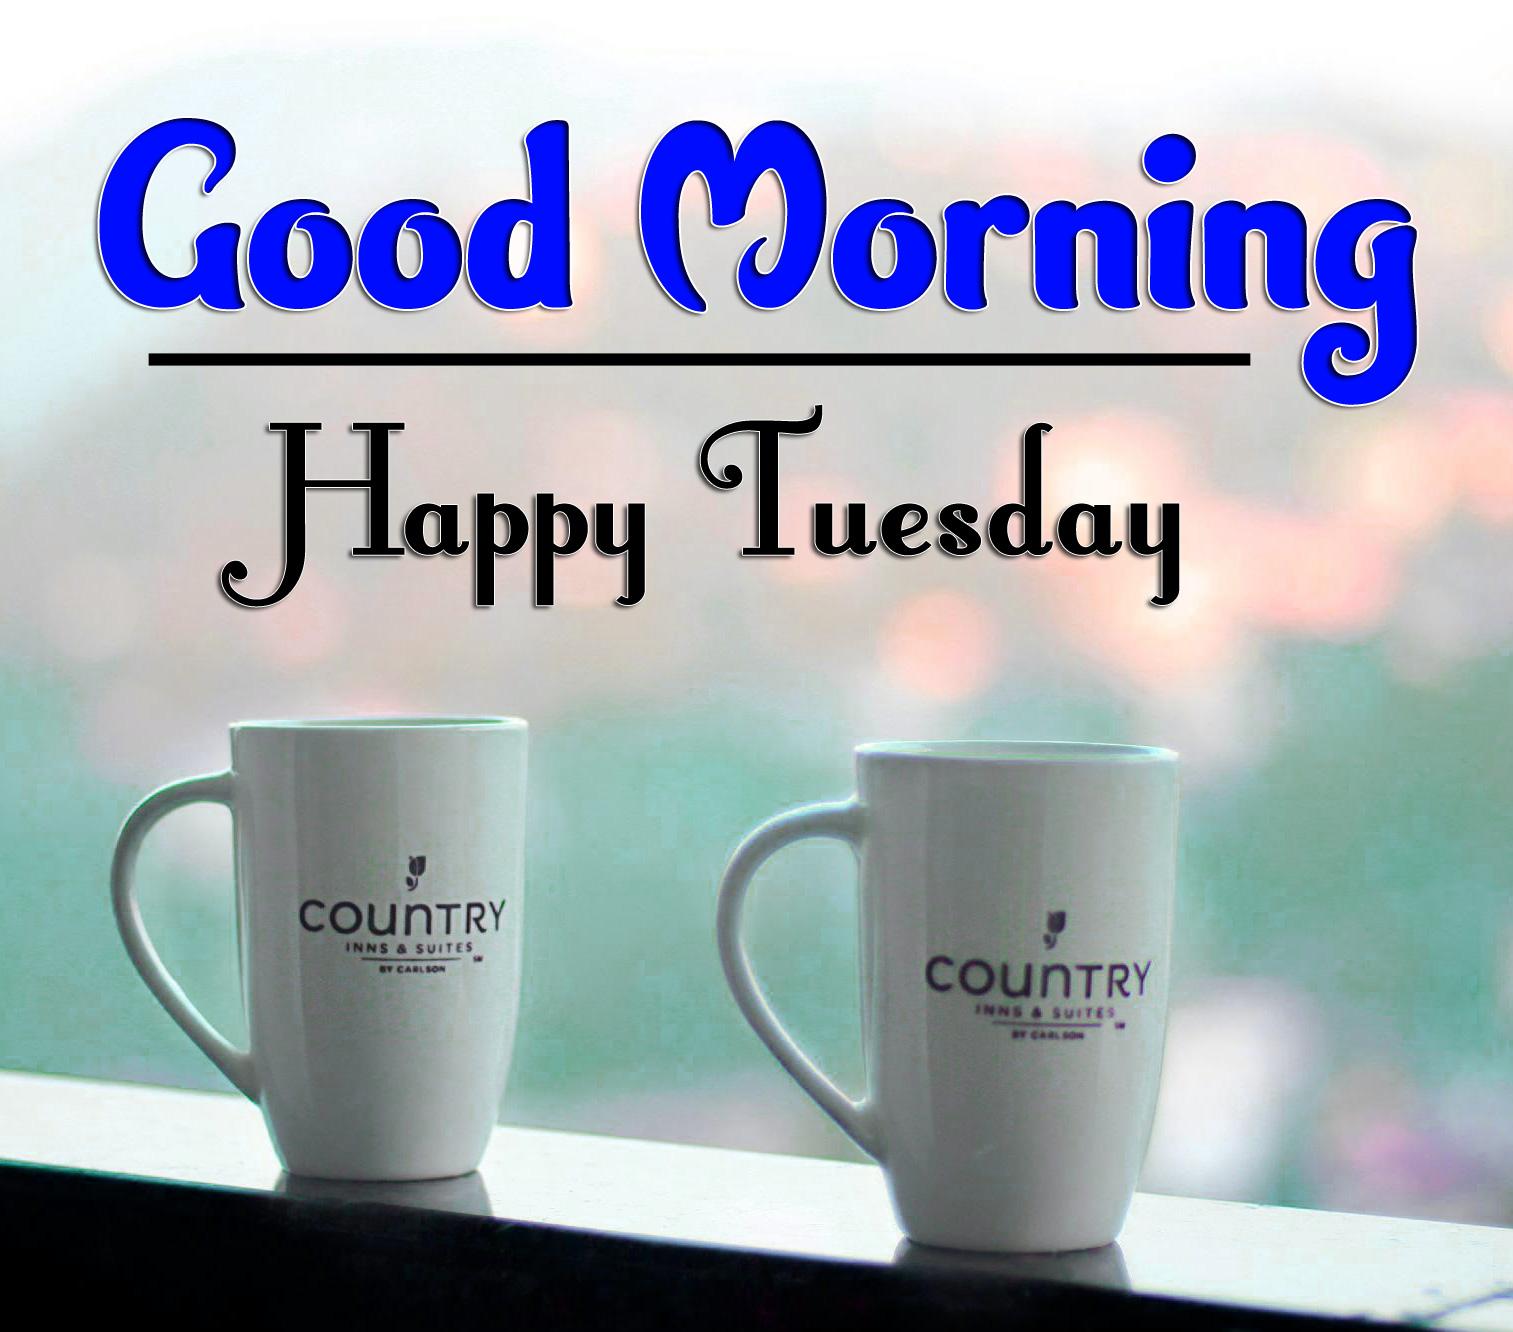 Tuesday Good Morning Wallpaper